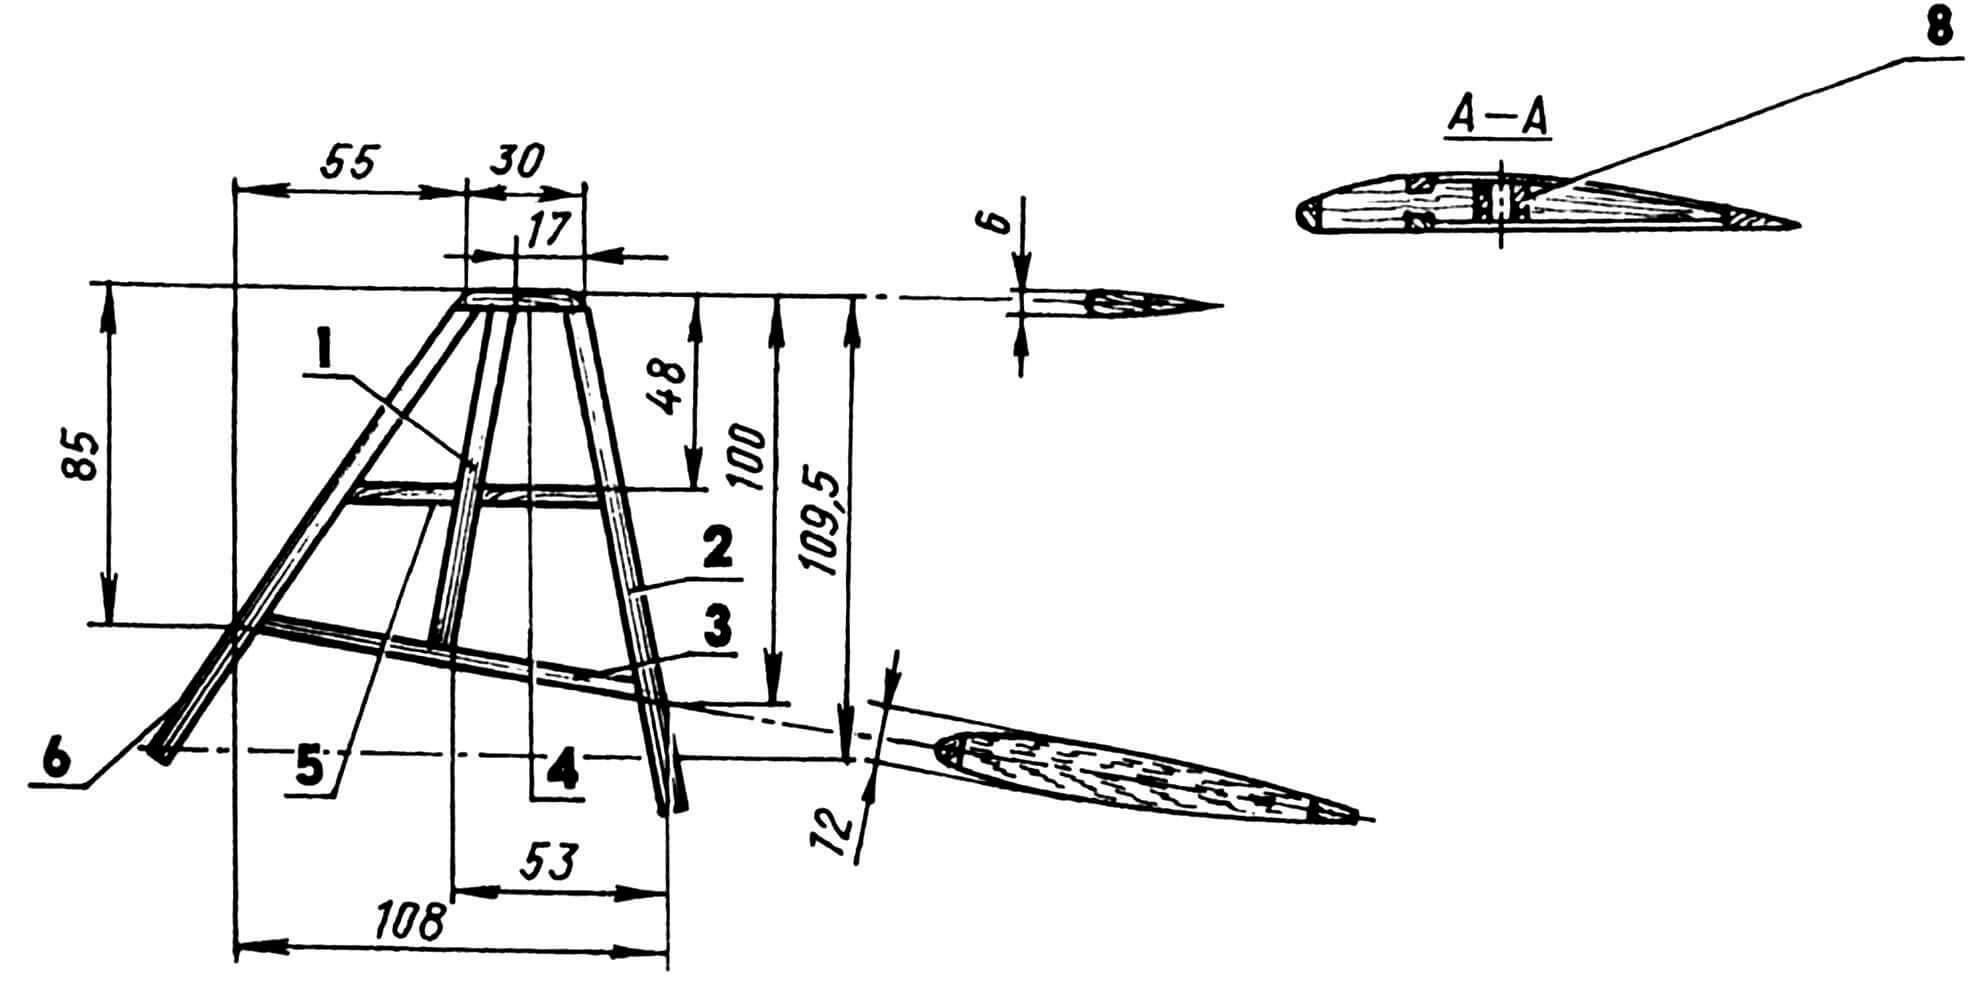 Киль: 1 — лонжерон (сосна, рейка 12x6);2 — кромка задняя (сосна 12x5); 3,4,5 — нервюры (сосна, рейка 12x6); 6 — кромка передняя (сосна, рейка 6x6).